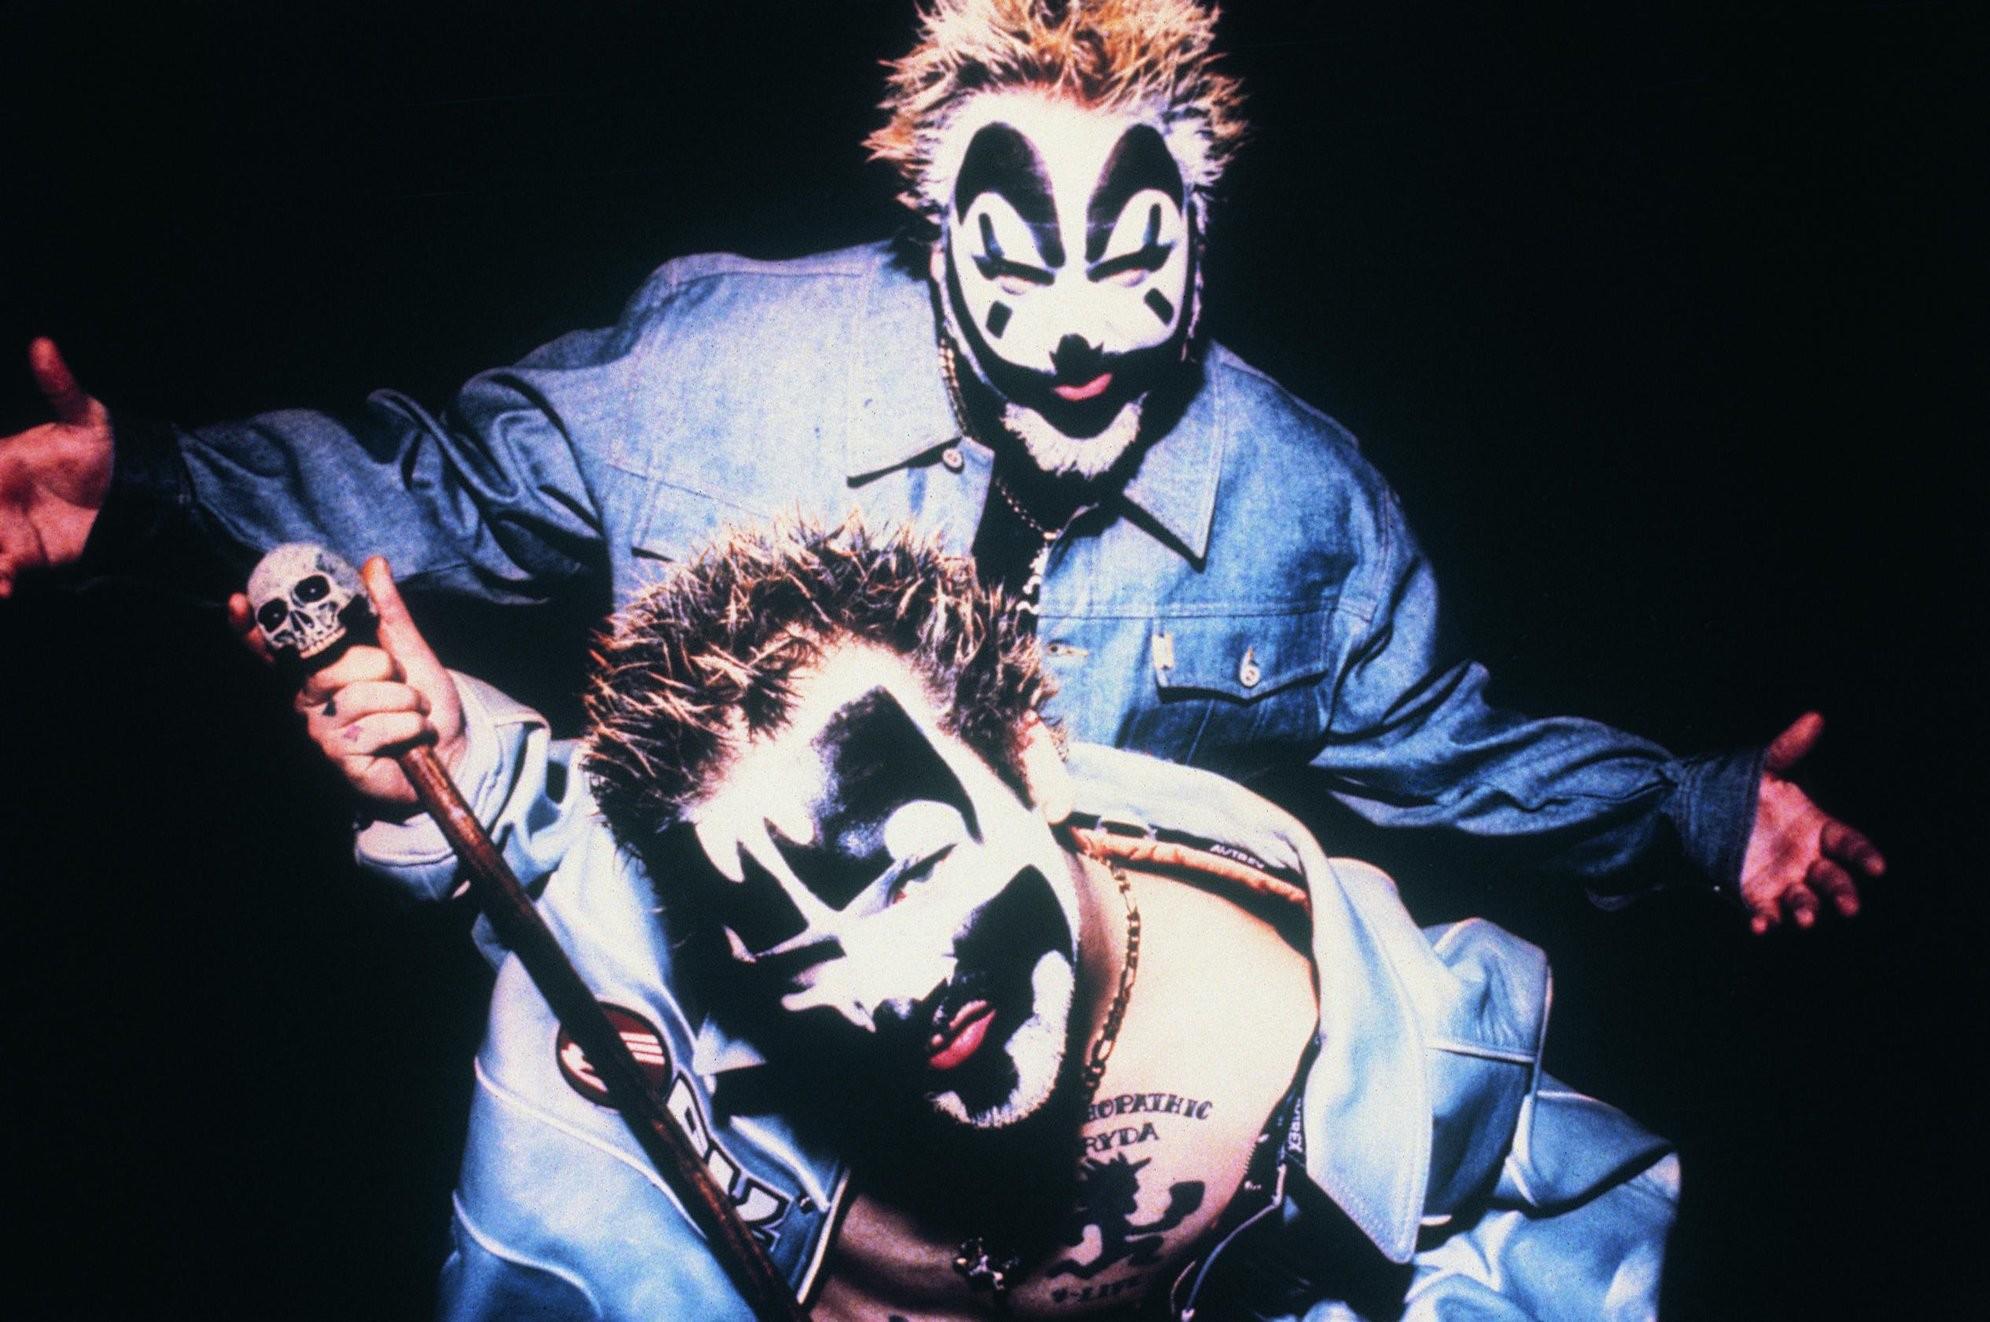 … insane clown posse icp juggalo rap rapper hip hop comedy …